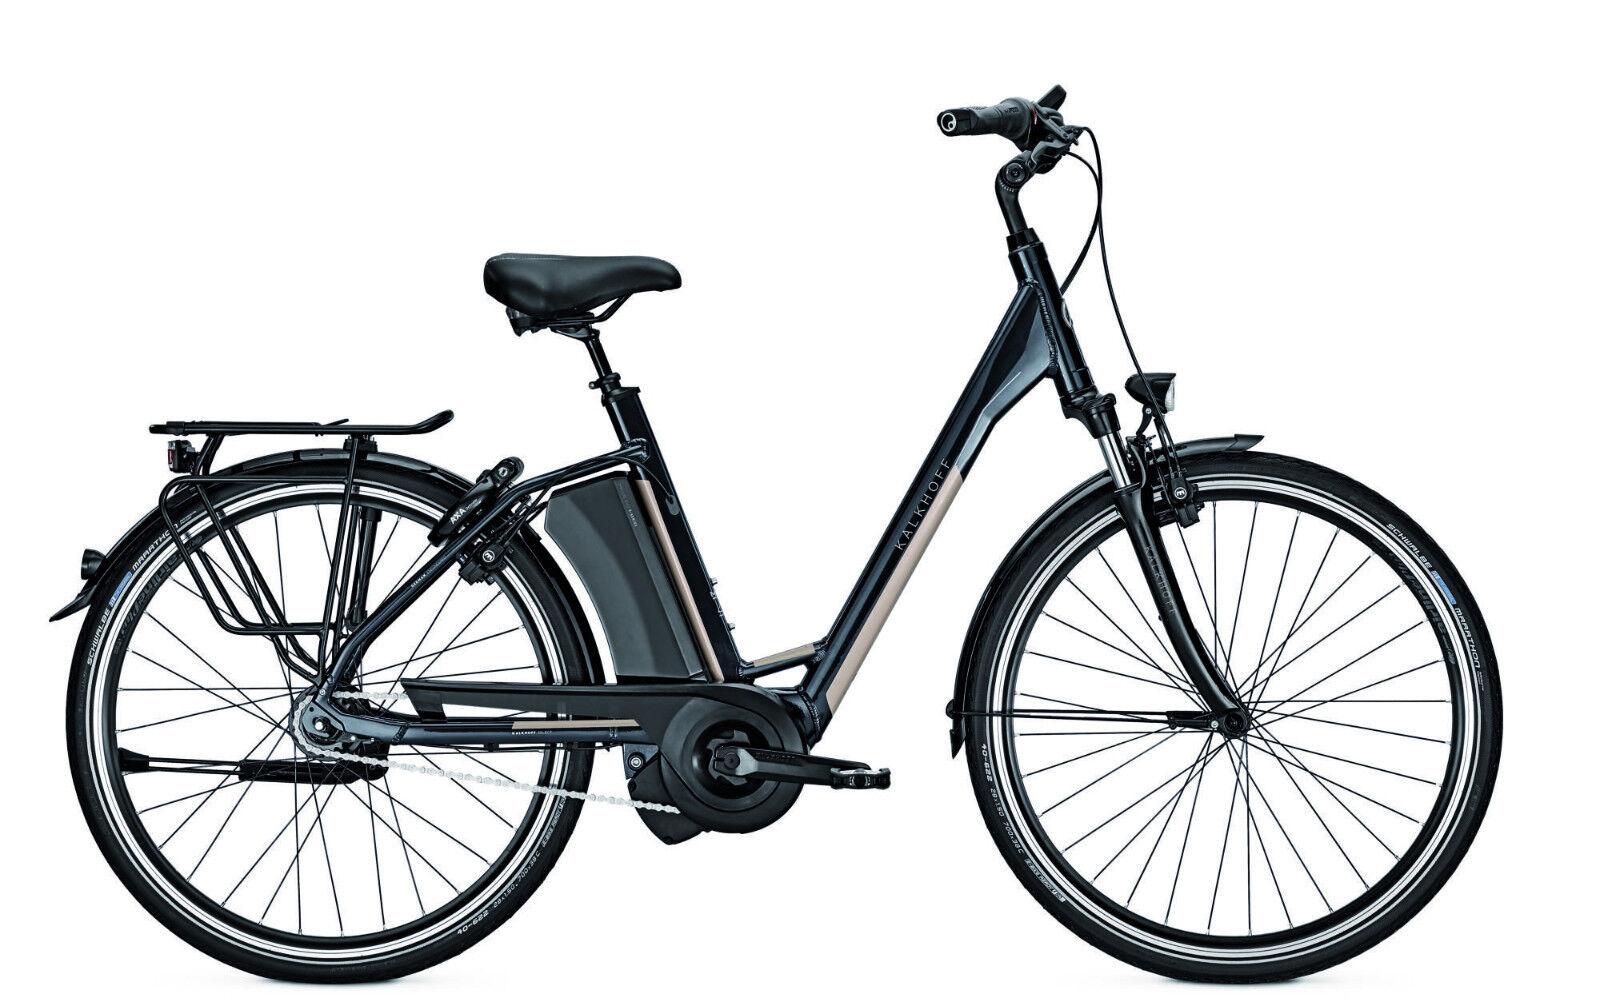 E-Bike Kalkhoff Select XXL i8 bis 170 kg 17.5 Ah 28 Zoll Wave Freilauf # NEU